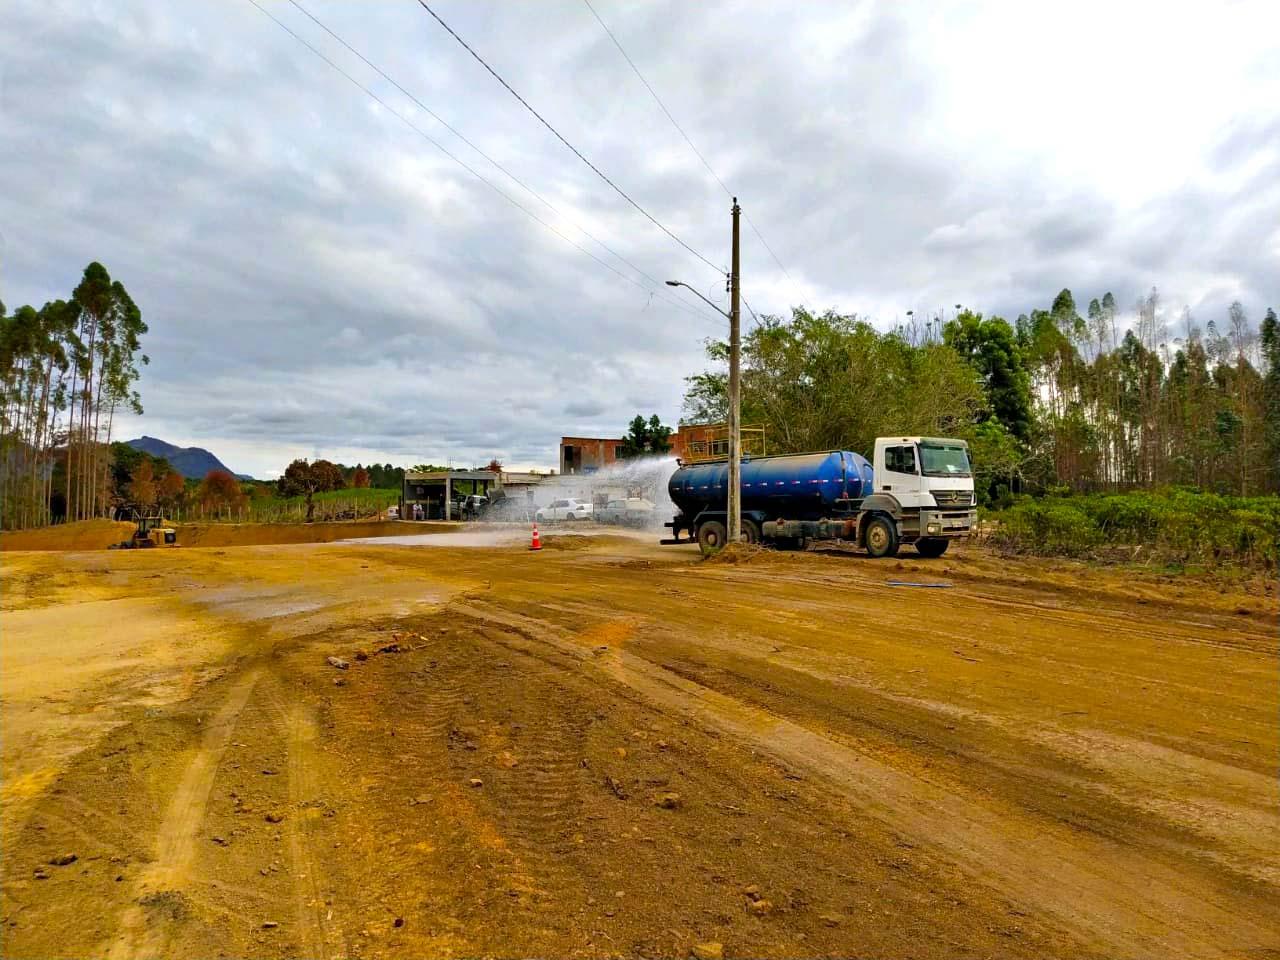 Andamento das obras da estrada do Contorno Norte Aracruz